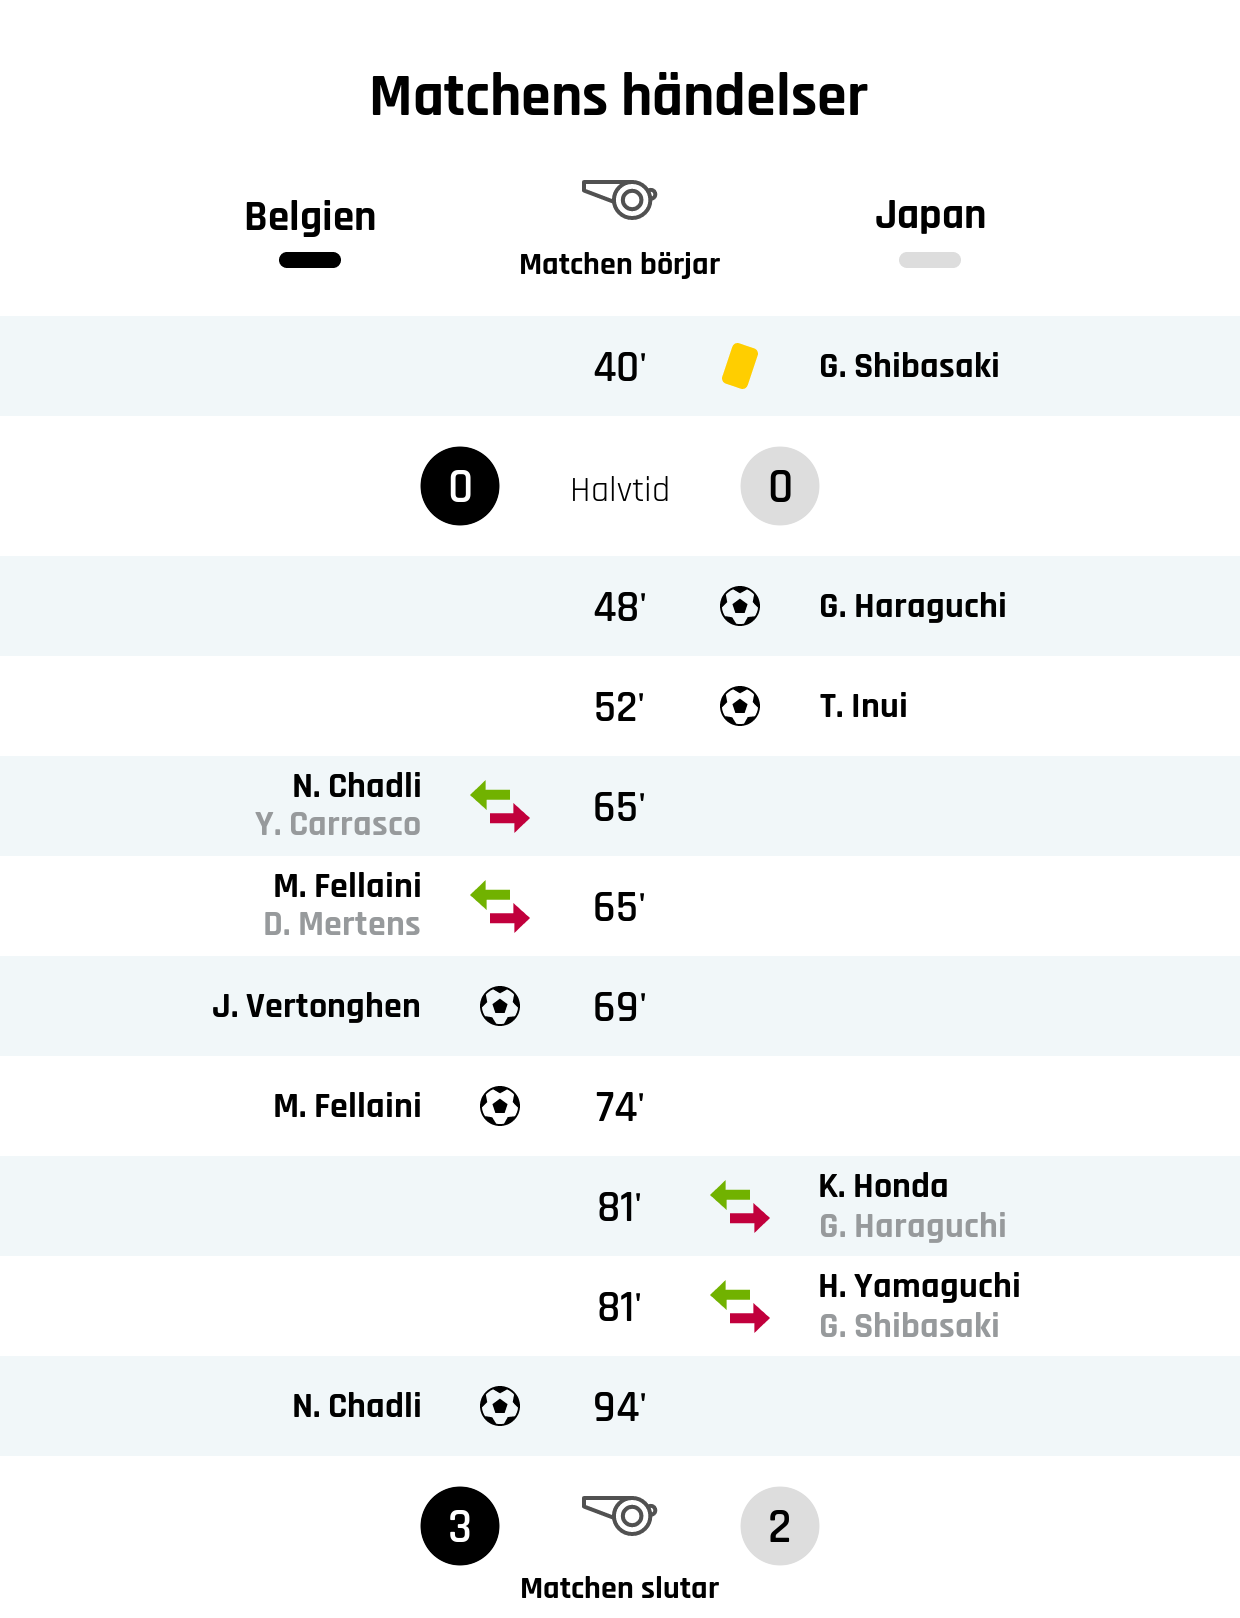 40' Gult kort: G. Shibasaki, Japan<br /> Resultat i halvtid: Belgien 0, Japan 0<br /> 48' Mål Japan: G. Haraguchi<br /> 52' Mål Japan: T. Inui<br /> 65' Belgiens byte: N. Chadli in, Y. Carrasco ut<br /> 65' Belgiens byte: M. Fellaini in, D. Mertens ut<br /> 69' Mål Belgien: J. Vertonghen<br /> 74' Mål Belgien: M. Fellaini<br /> 81' Japans byte: K. Honda in, G. Haraguchi ut<br /> 81' Japans byte: H. Yamaguchi in, G. Shibasaki ut<br /> 94' Mål Belgien: N. Chadli<br /> Slutresultat: Belgien 3, Japan 2